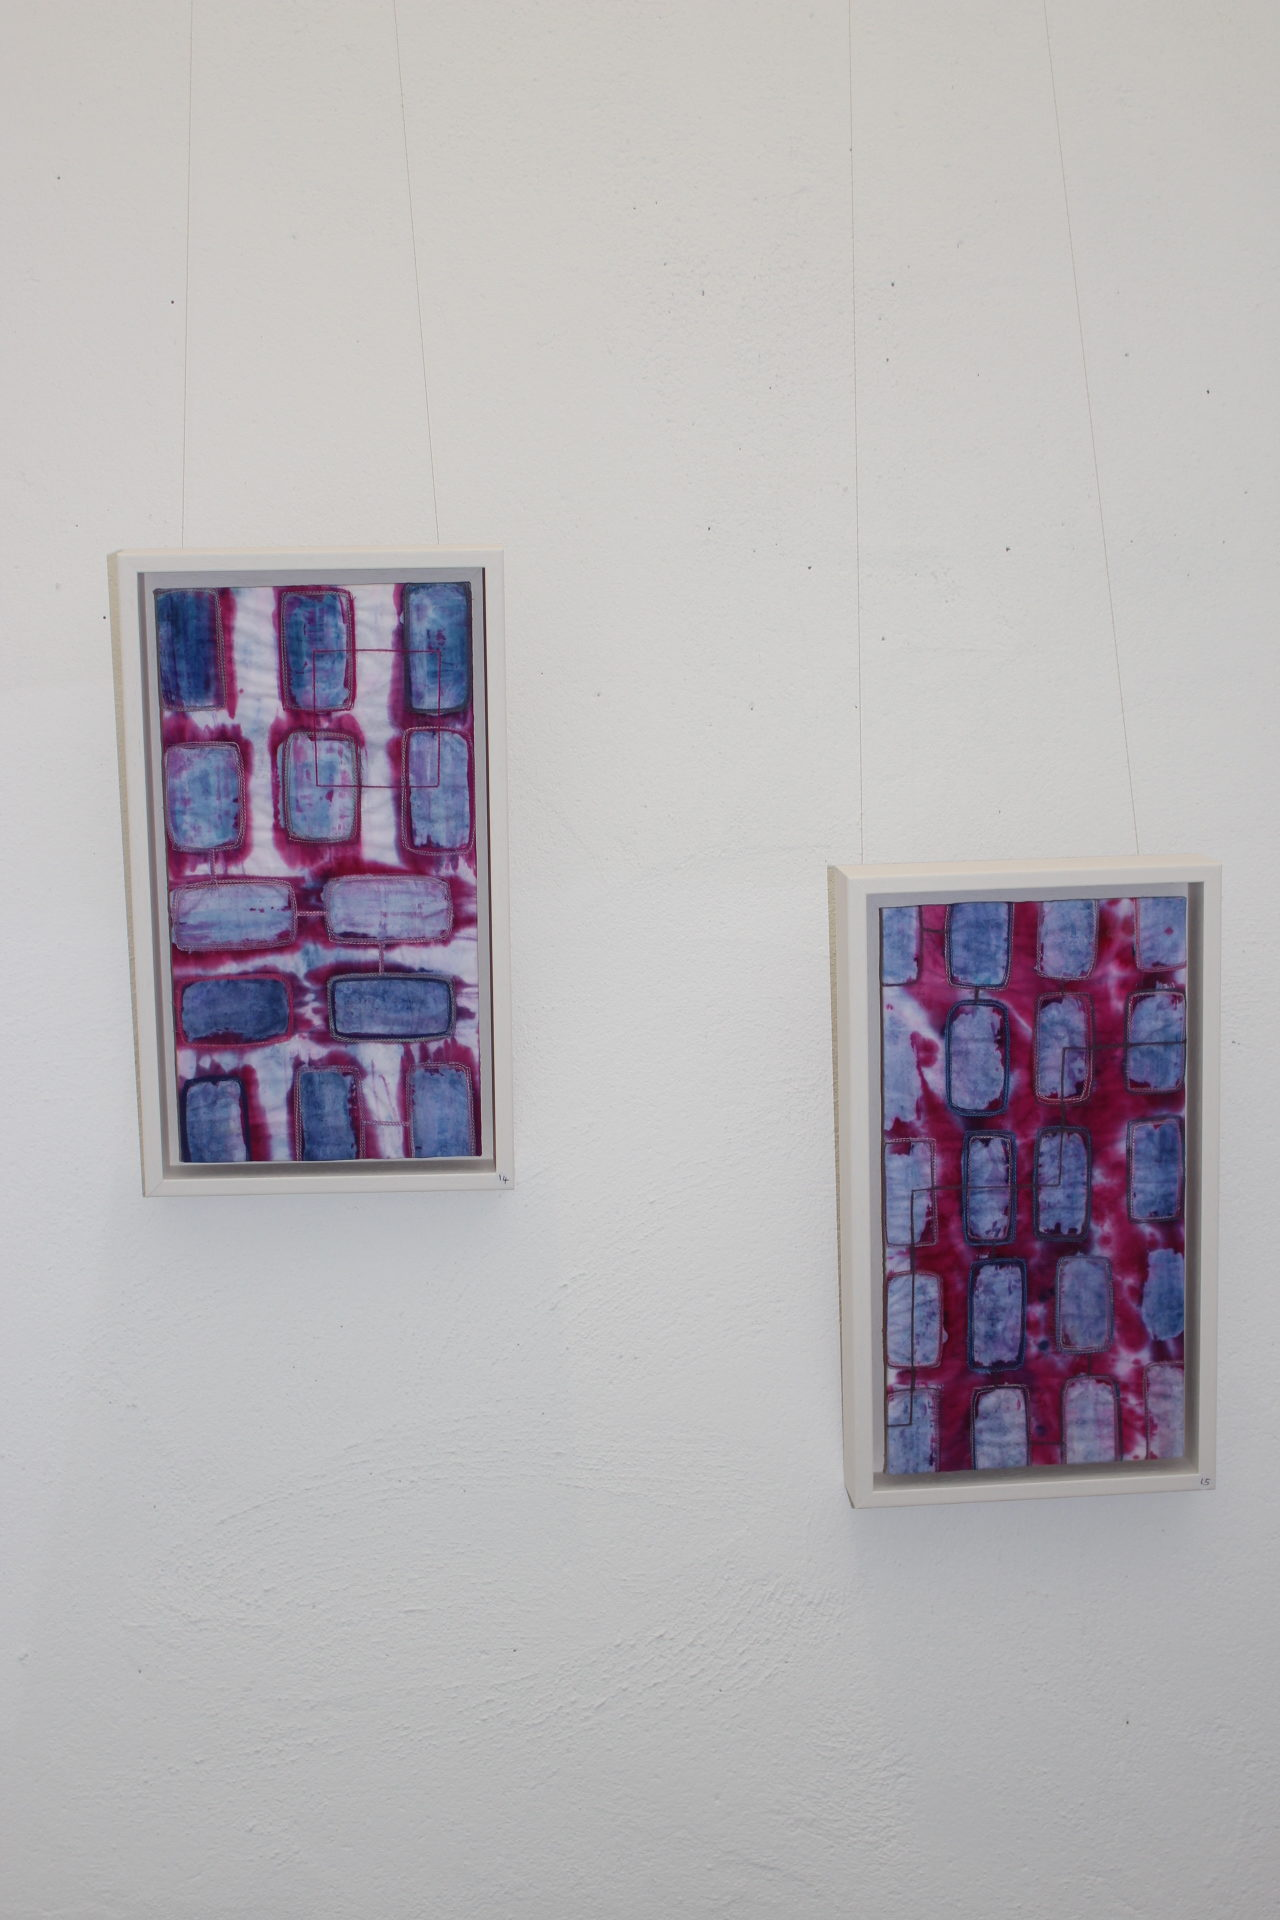 Bricks and Mortar, Barbara Seery, element15